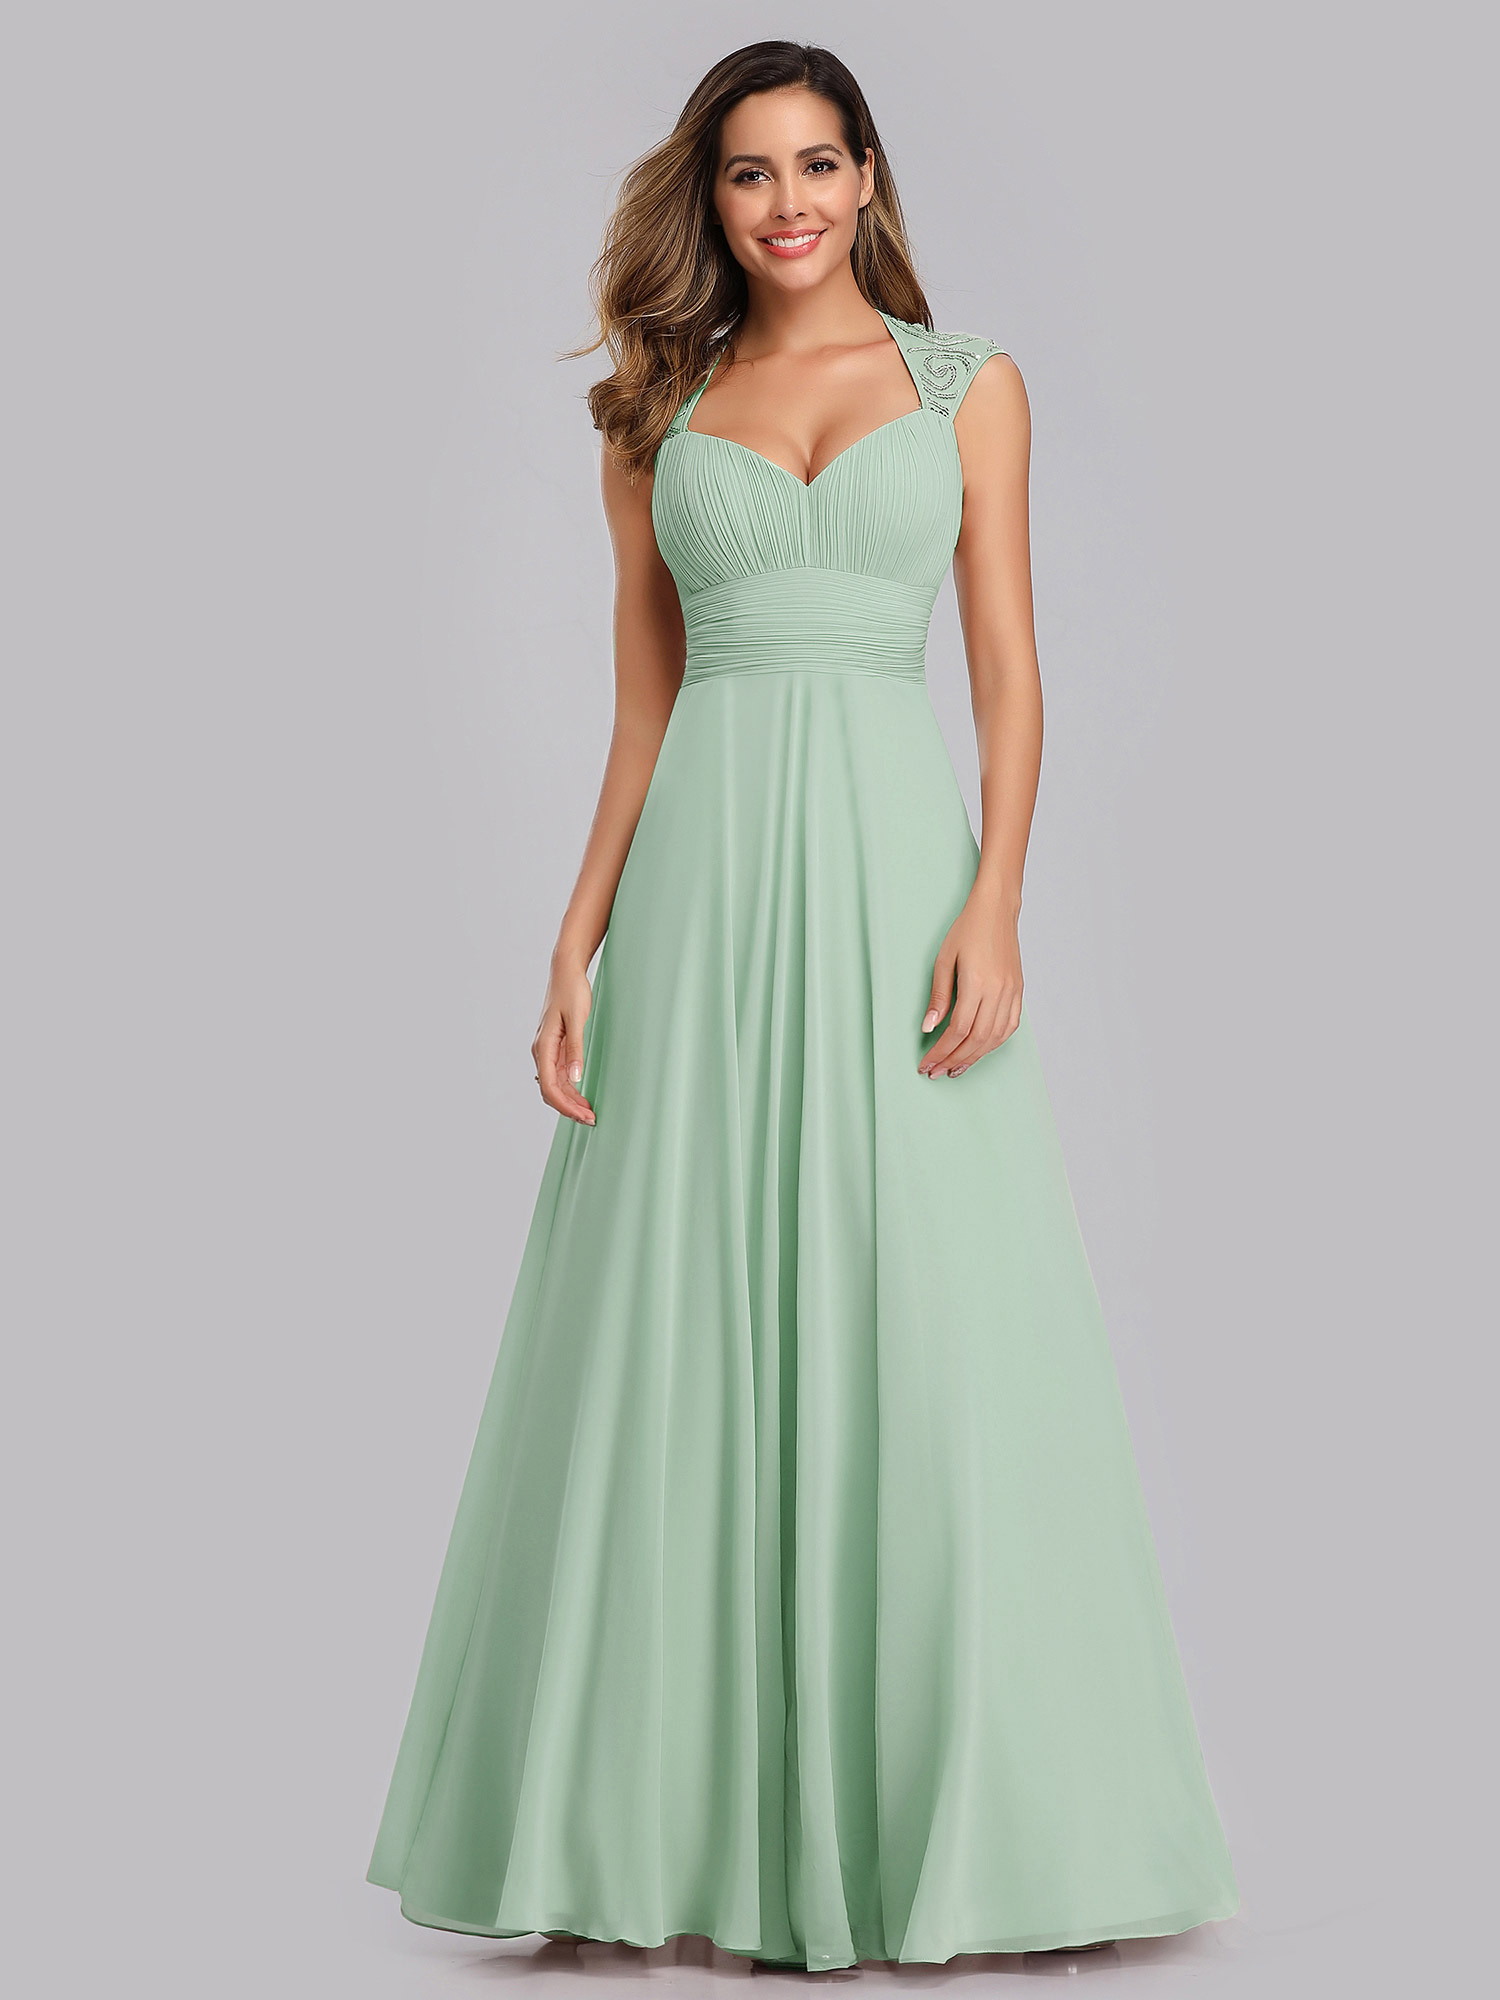 Cap Sleeve Bridesmaid Dress Long V-neck Evening Party Dresses 09672 ...